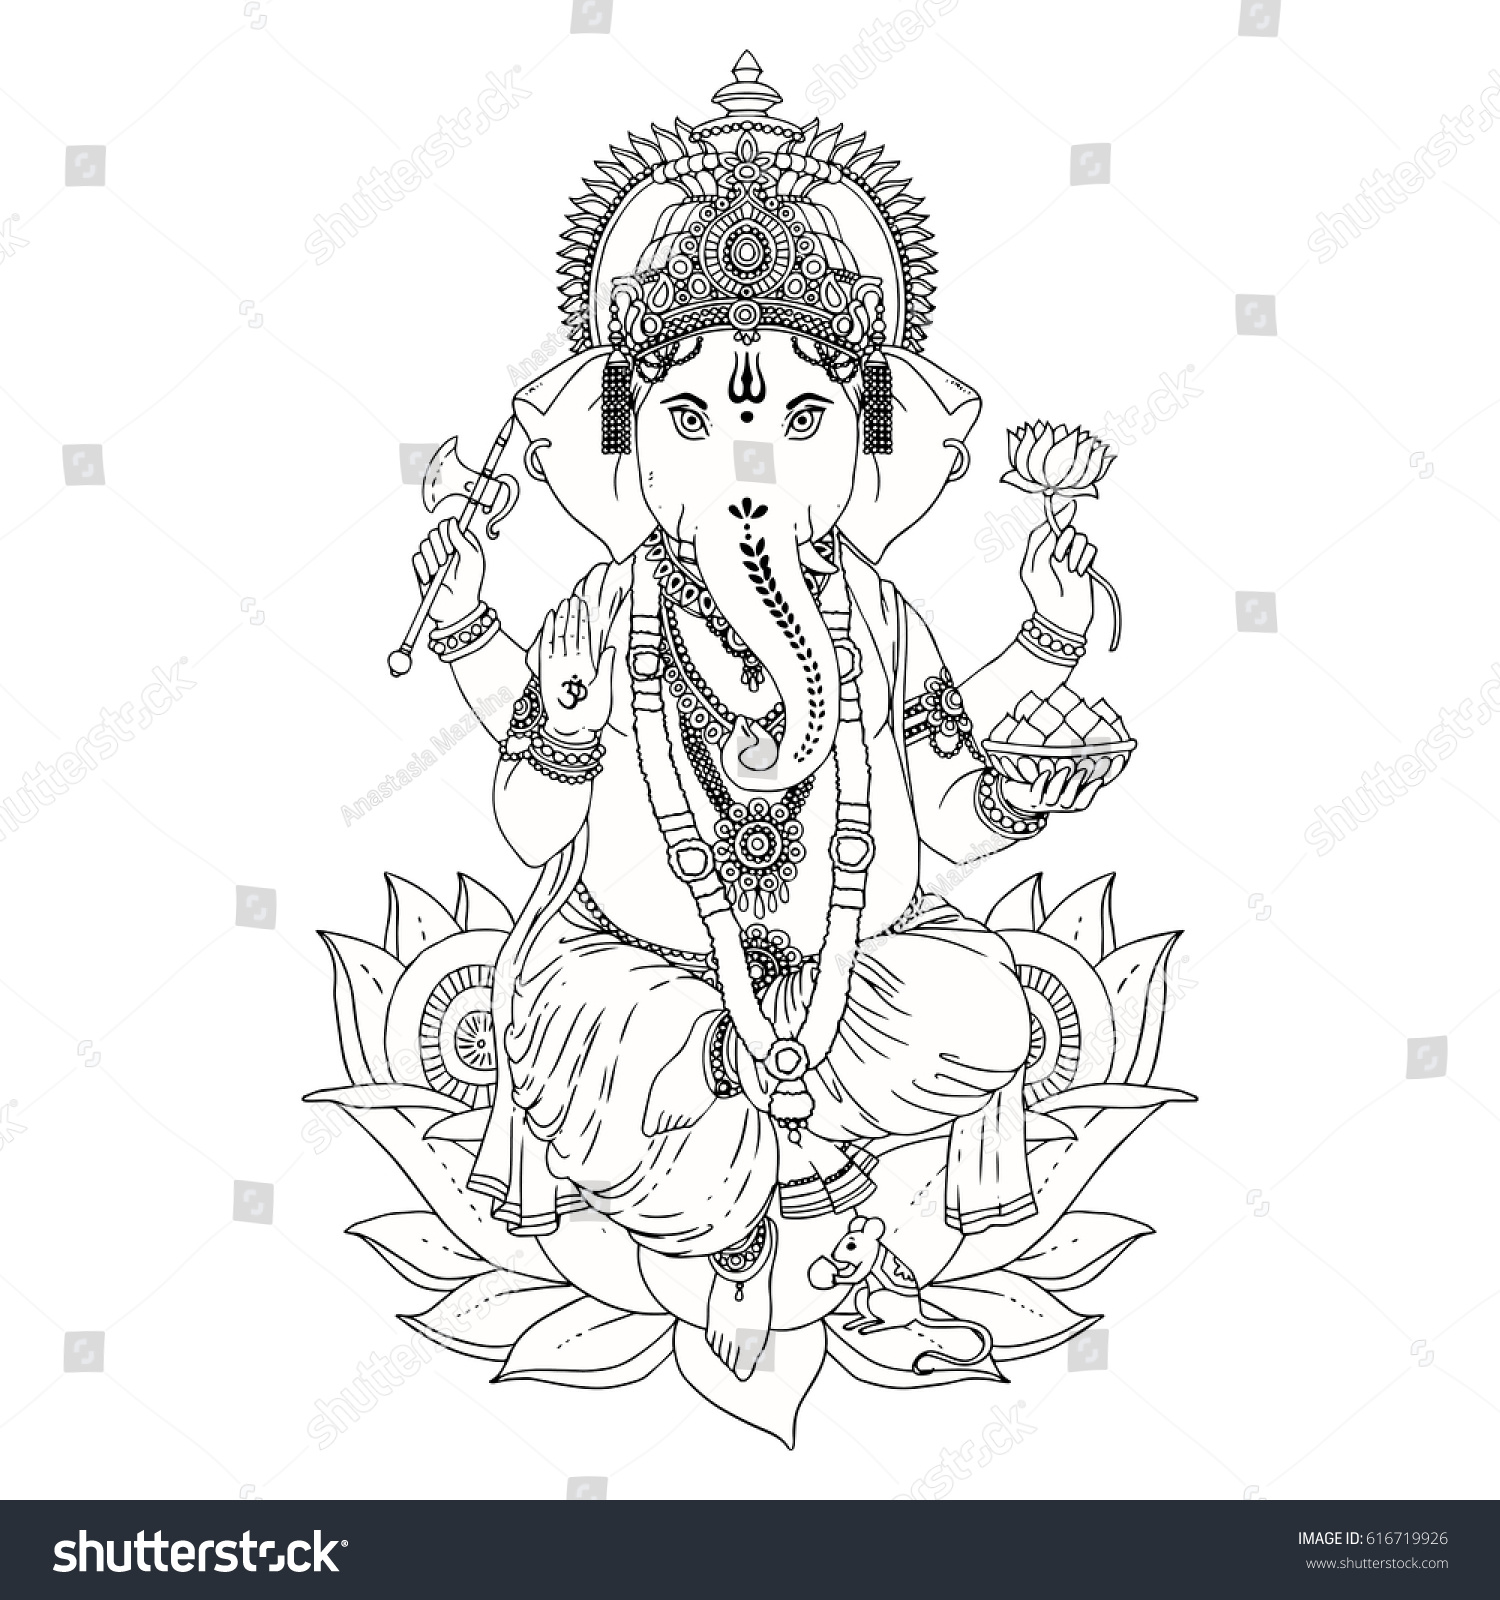 Dancing Hindu Lord Ganesha Vector Illustration Vector de ...